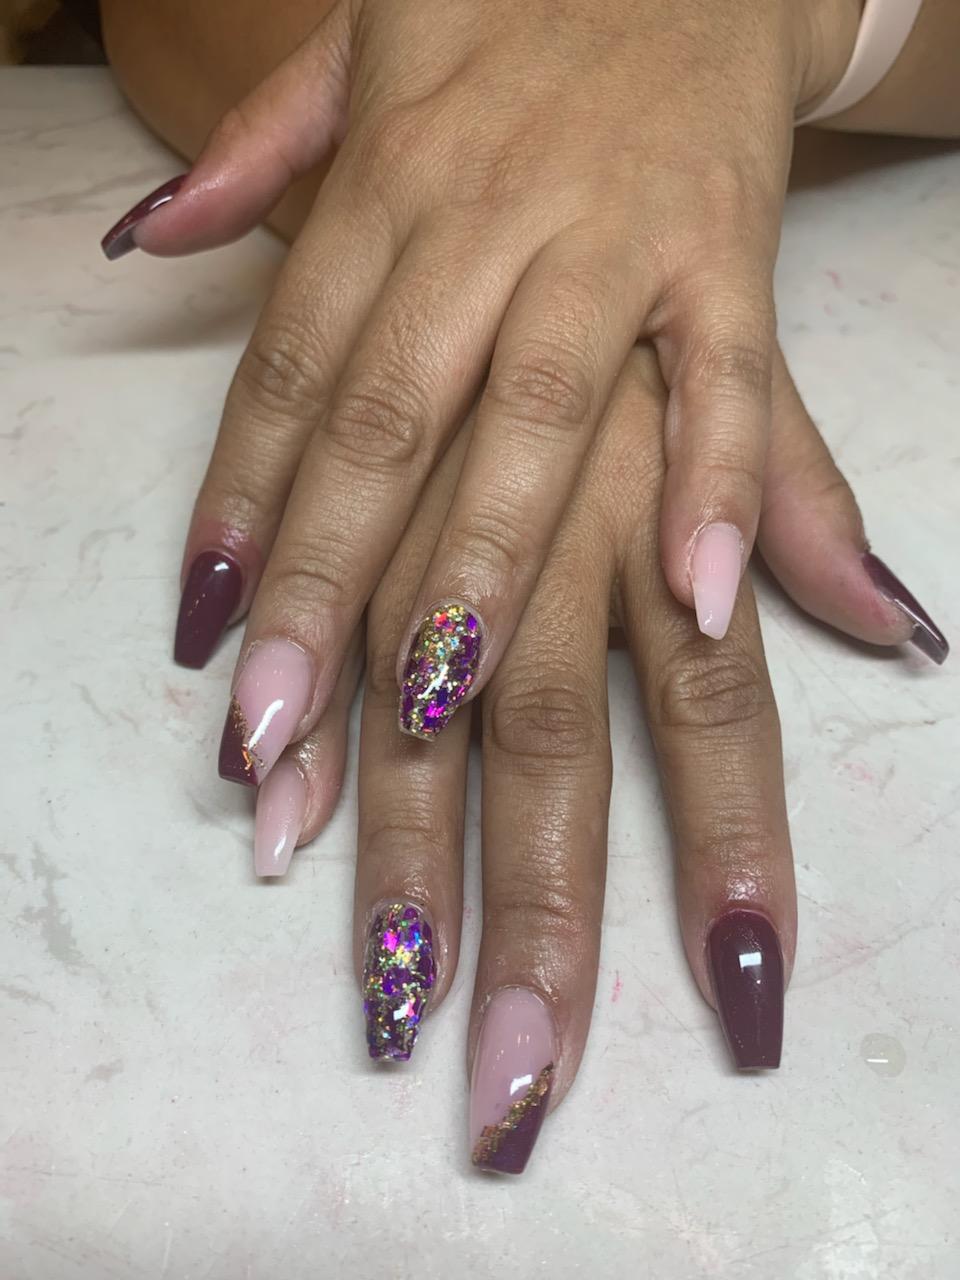 United Nails & Spa - The best nail salon Northwest Side San Antonio TX 78249